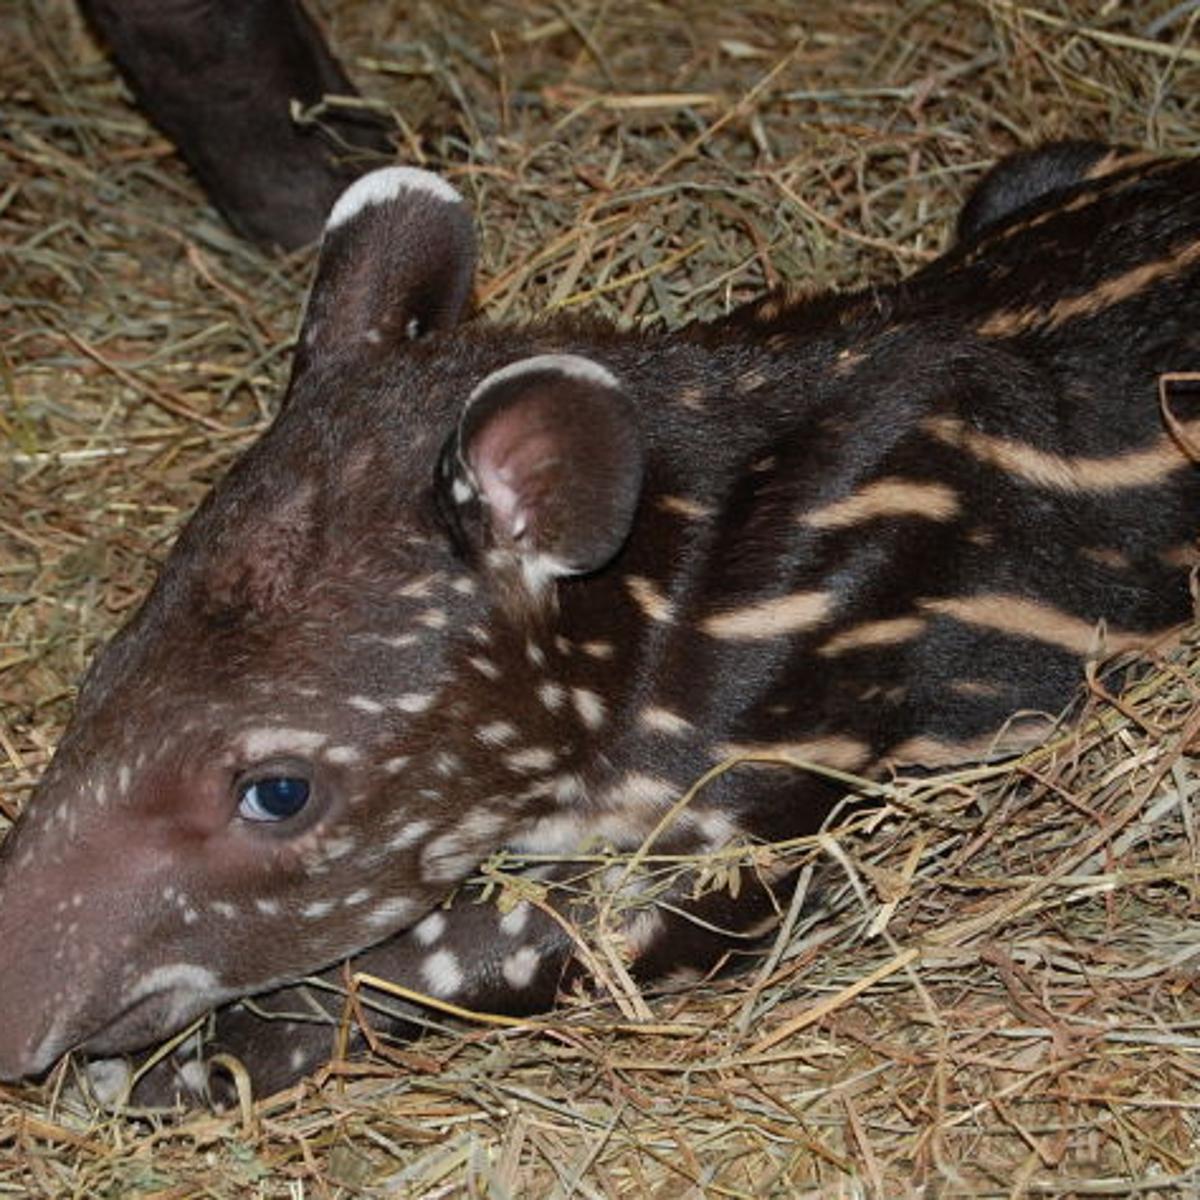 Baby Brazilian tapir on display at Richmond zoo | Richmond Local News |  richmond.com